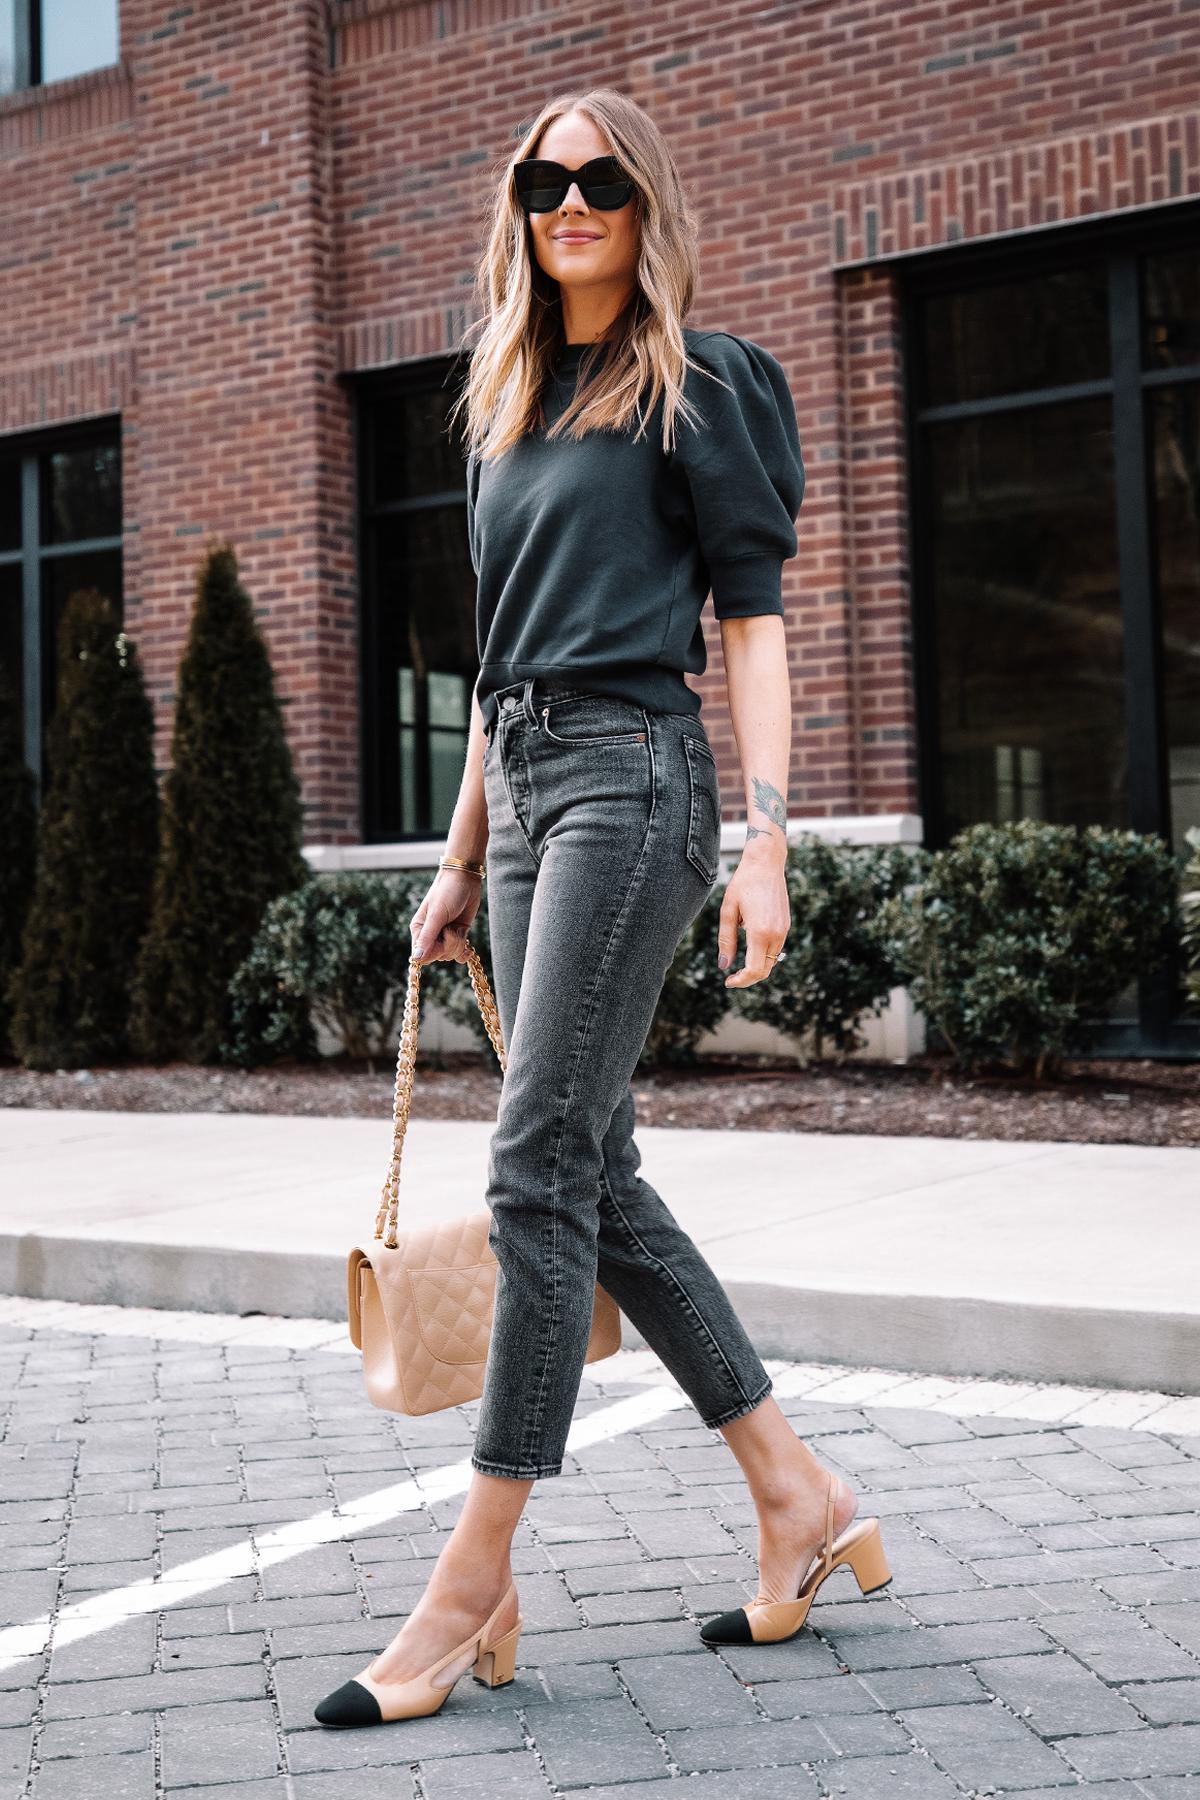 Fashion Jackson Wearing Frame Navy Puff Sleeve Sweatshirt Levis Wedgie Black Jeans Chanel Slingbacks